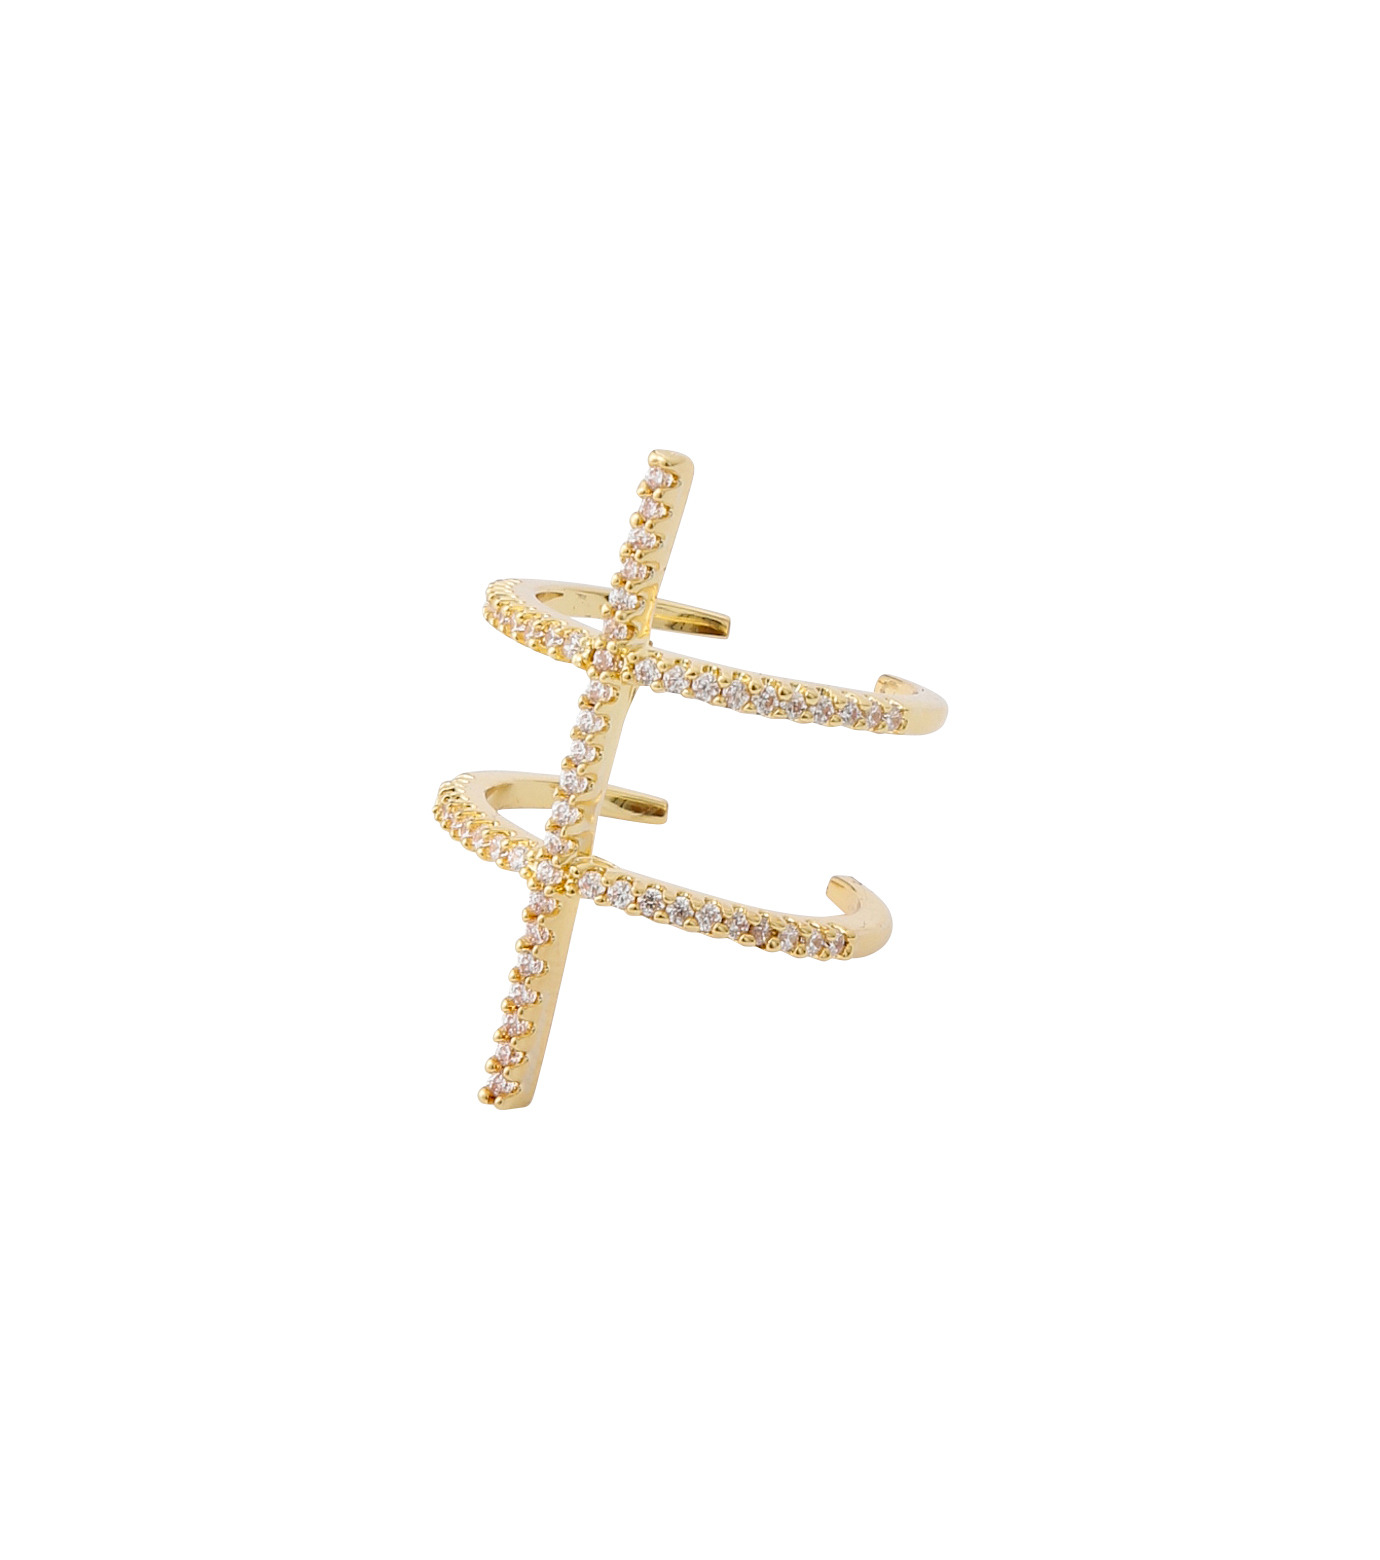 Fallon(ファロン)のPave Ladder Ring-GOLD(リング/ring)-FR21550-2 拡大詳細画像2